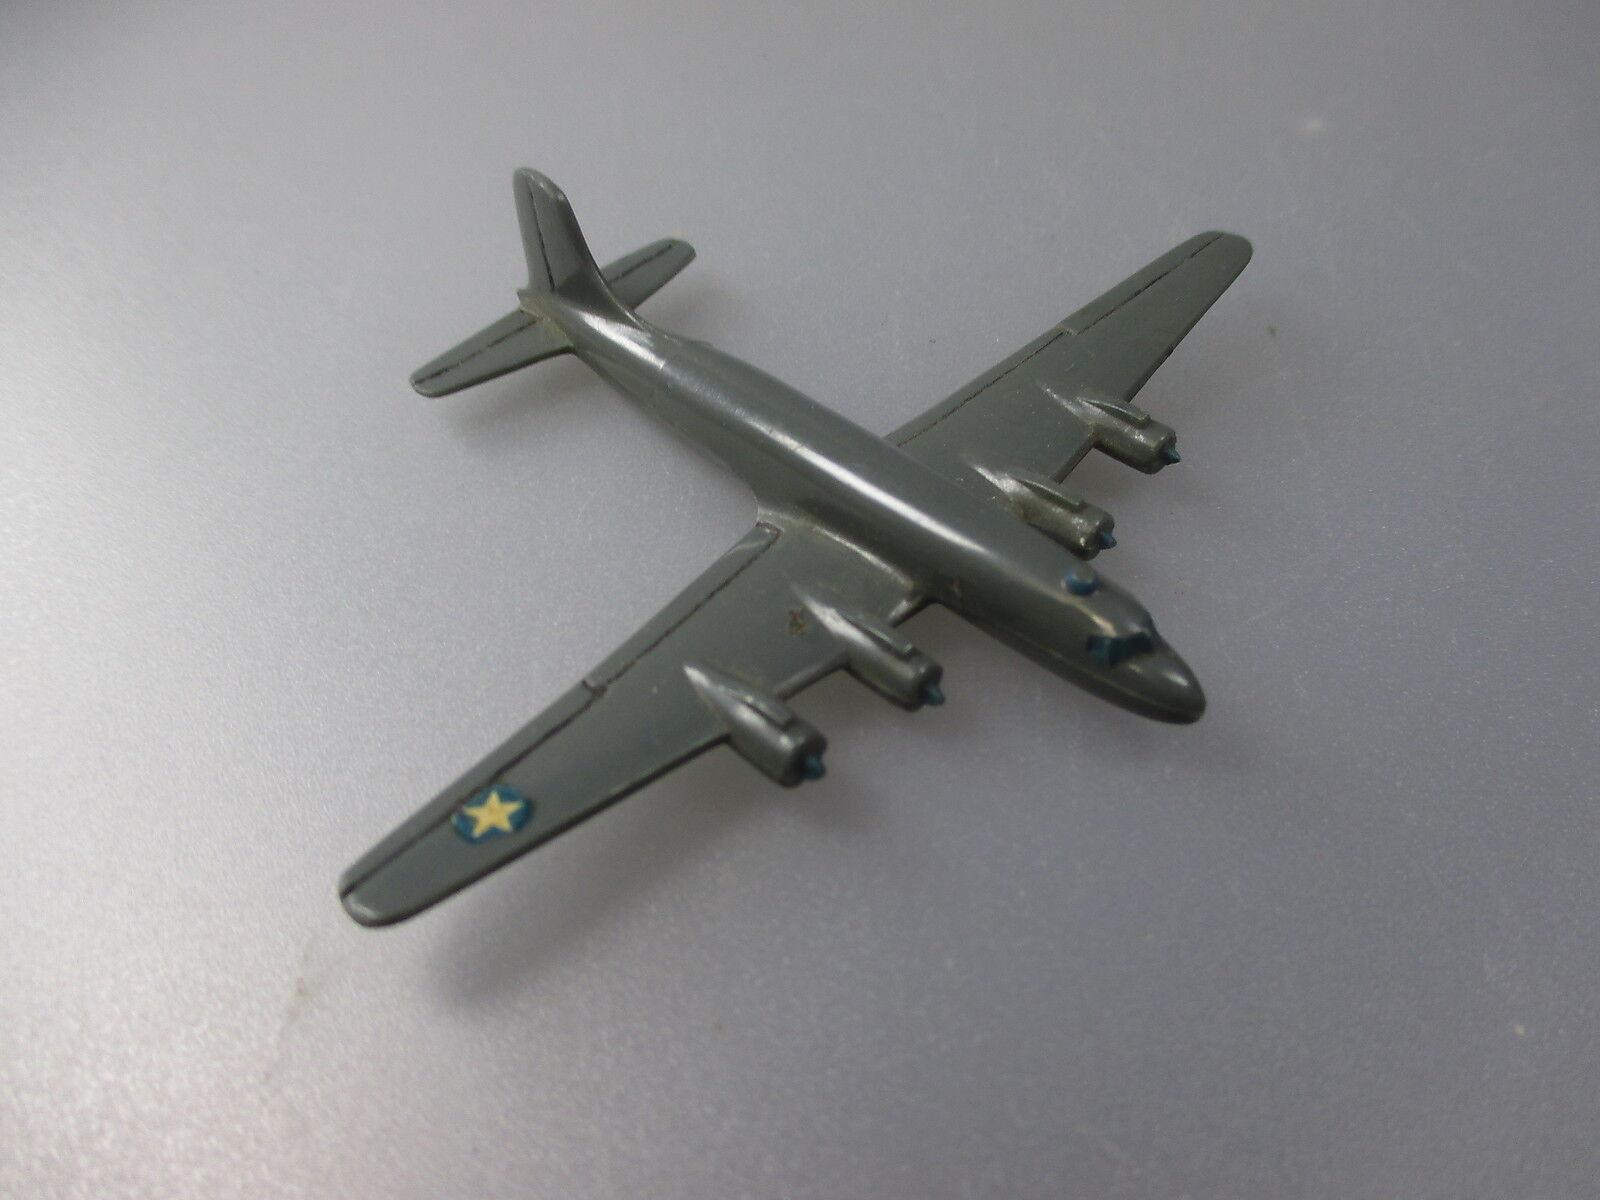 Wire  aereo c54 cielomaster da ponti aereiserie in grigio verde, 1 400 scatola13